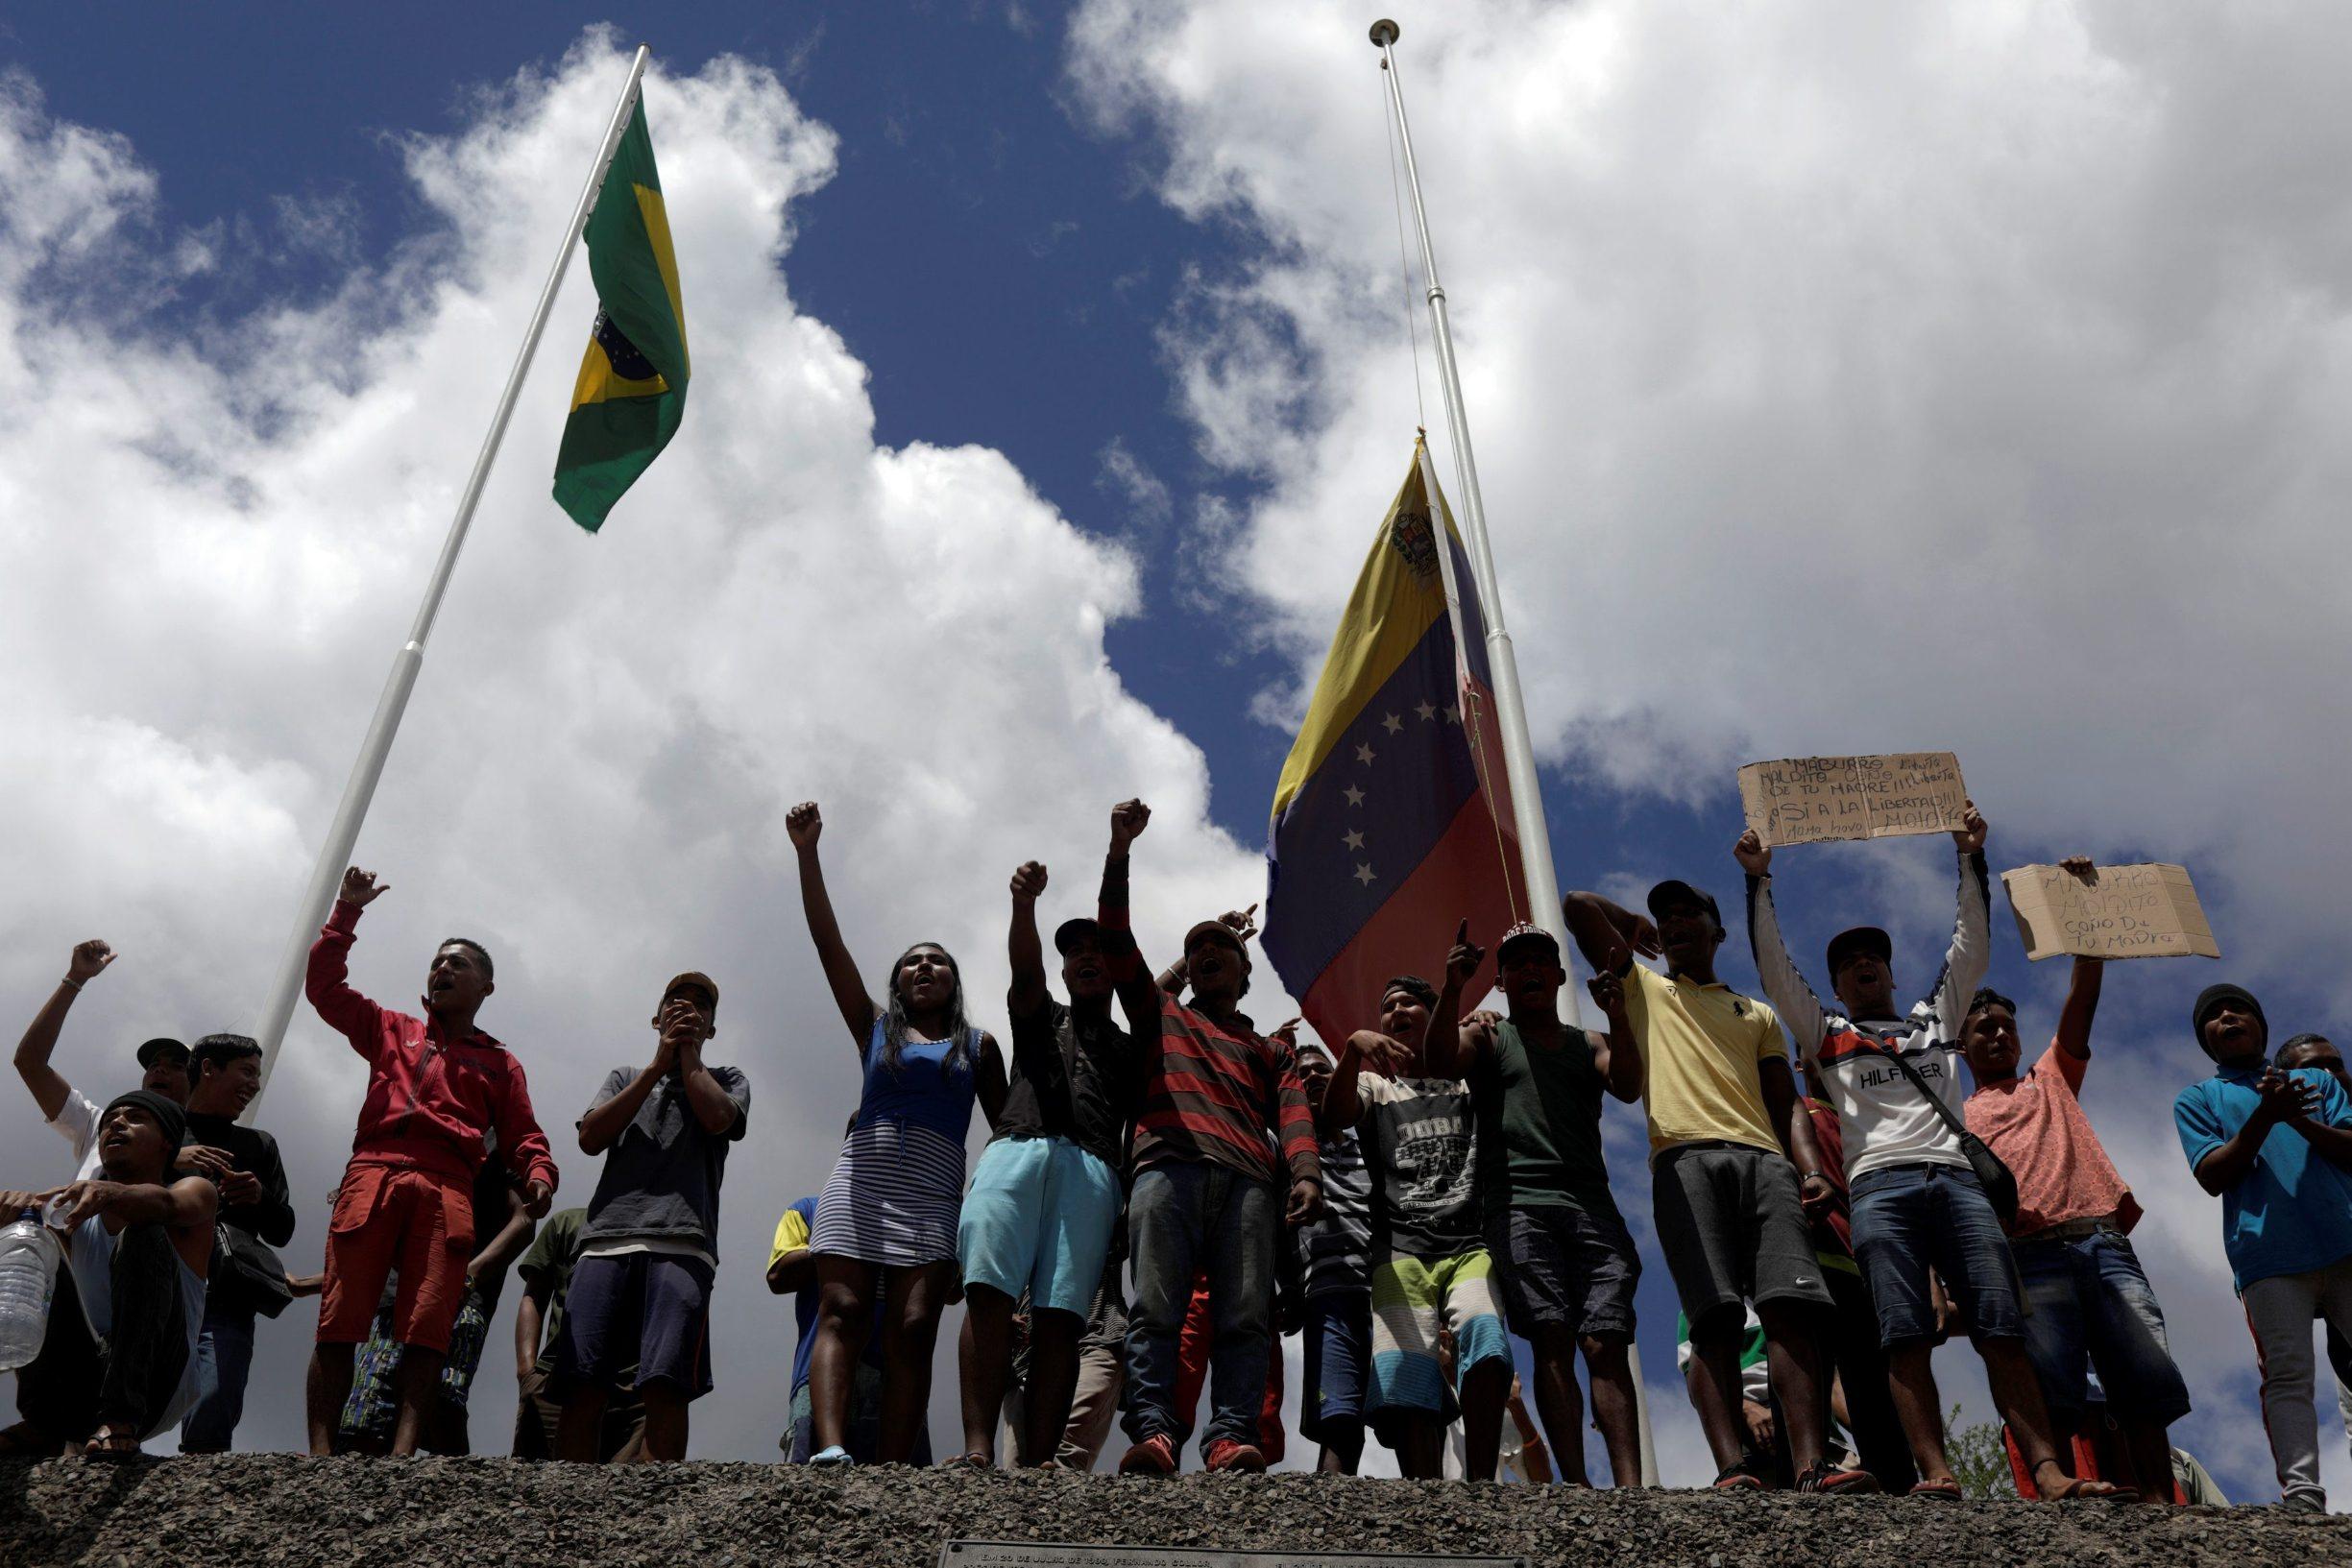 People waiting to cross to Venezuela gesture at the border between Venezuela and Brazil in Pacaraima, Roraima state, Brazil, February 22, 2019. REUTERS/Ricardo Moraes